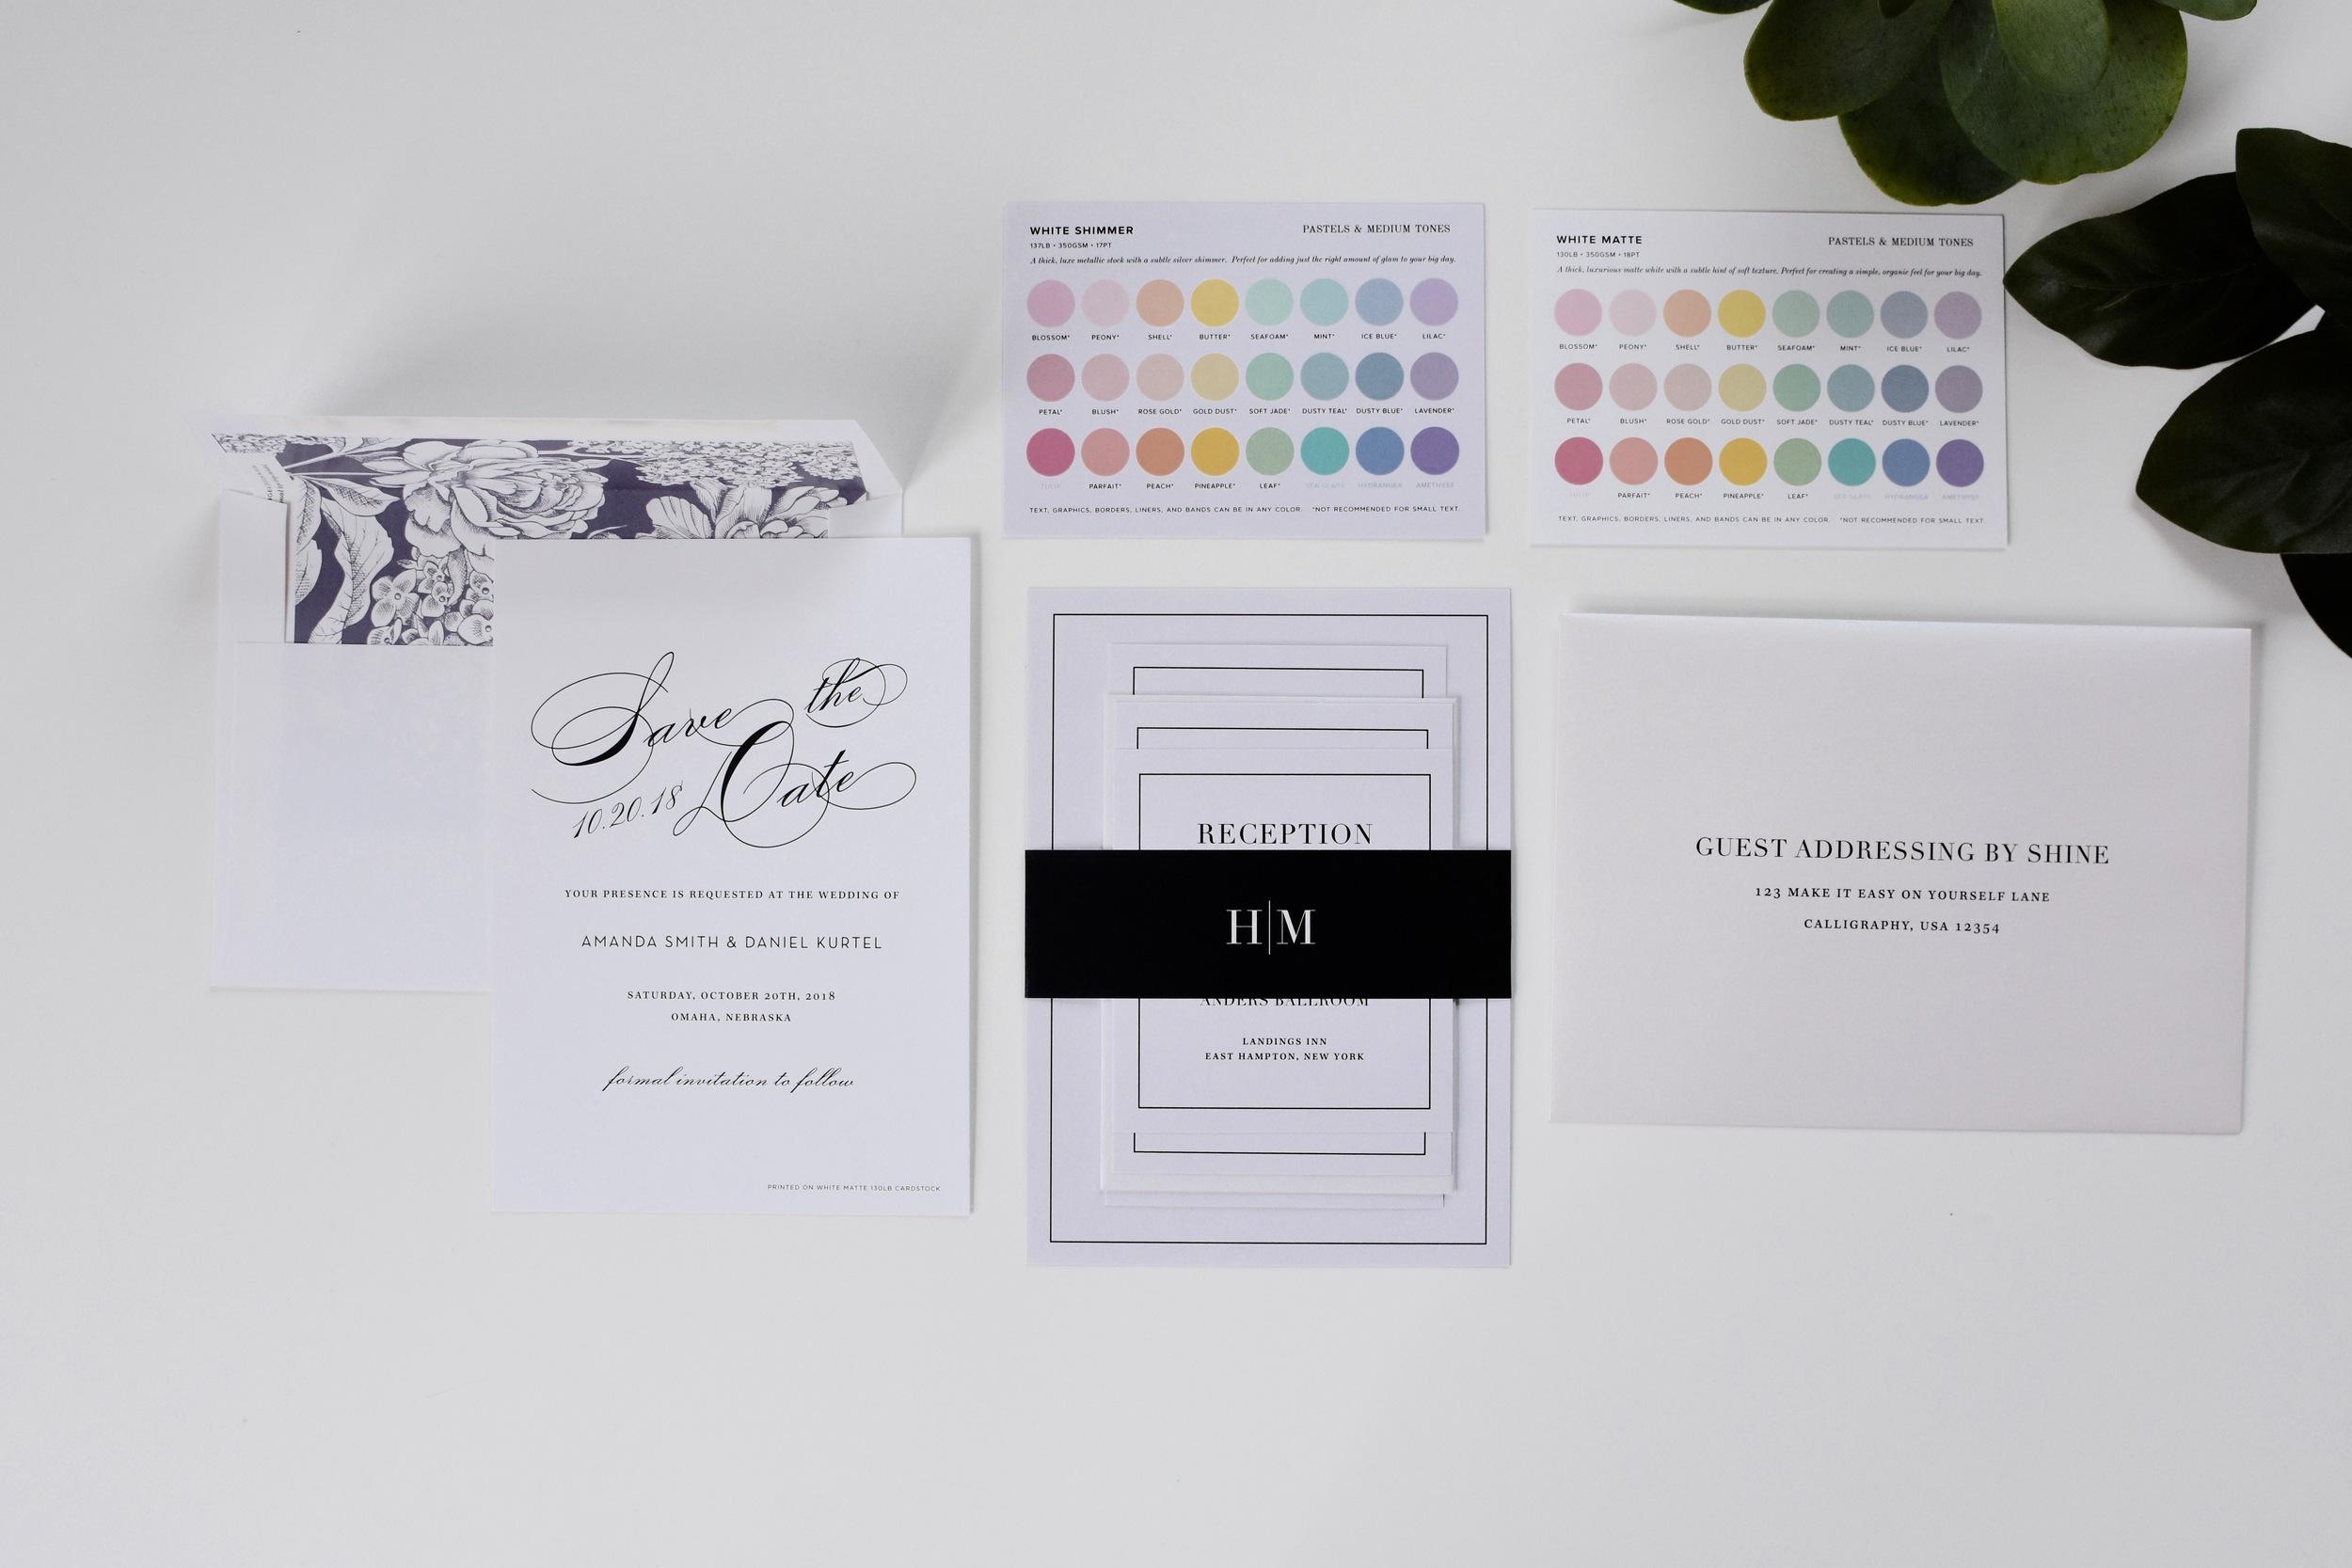 wedding invitation samples from Shine Wedding Invitations